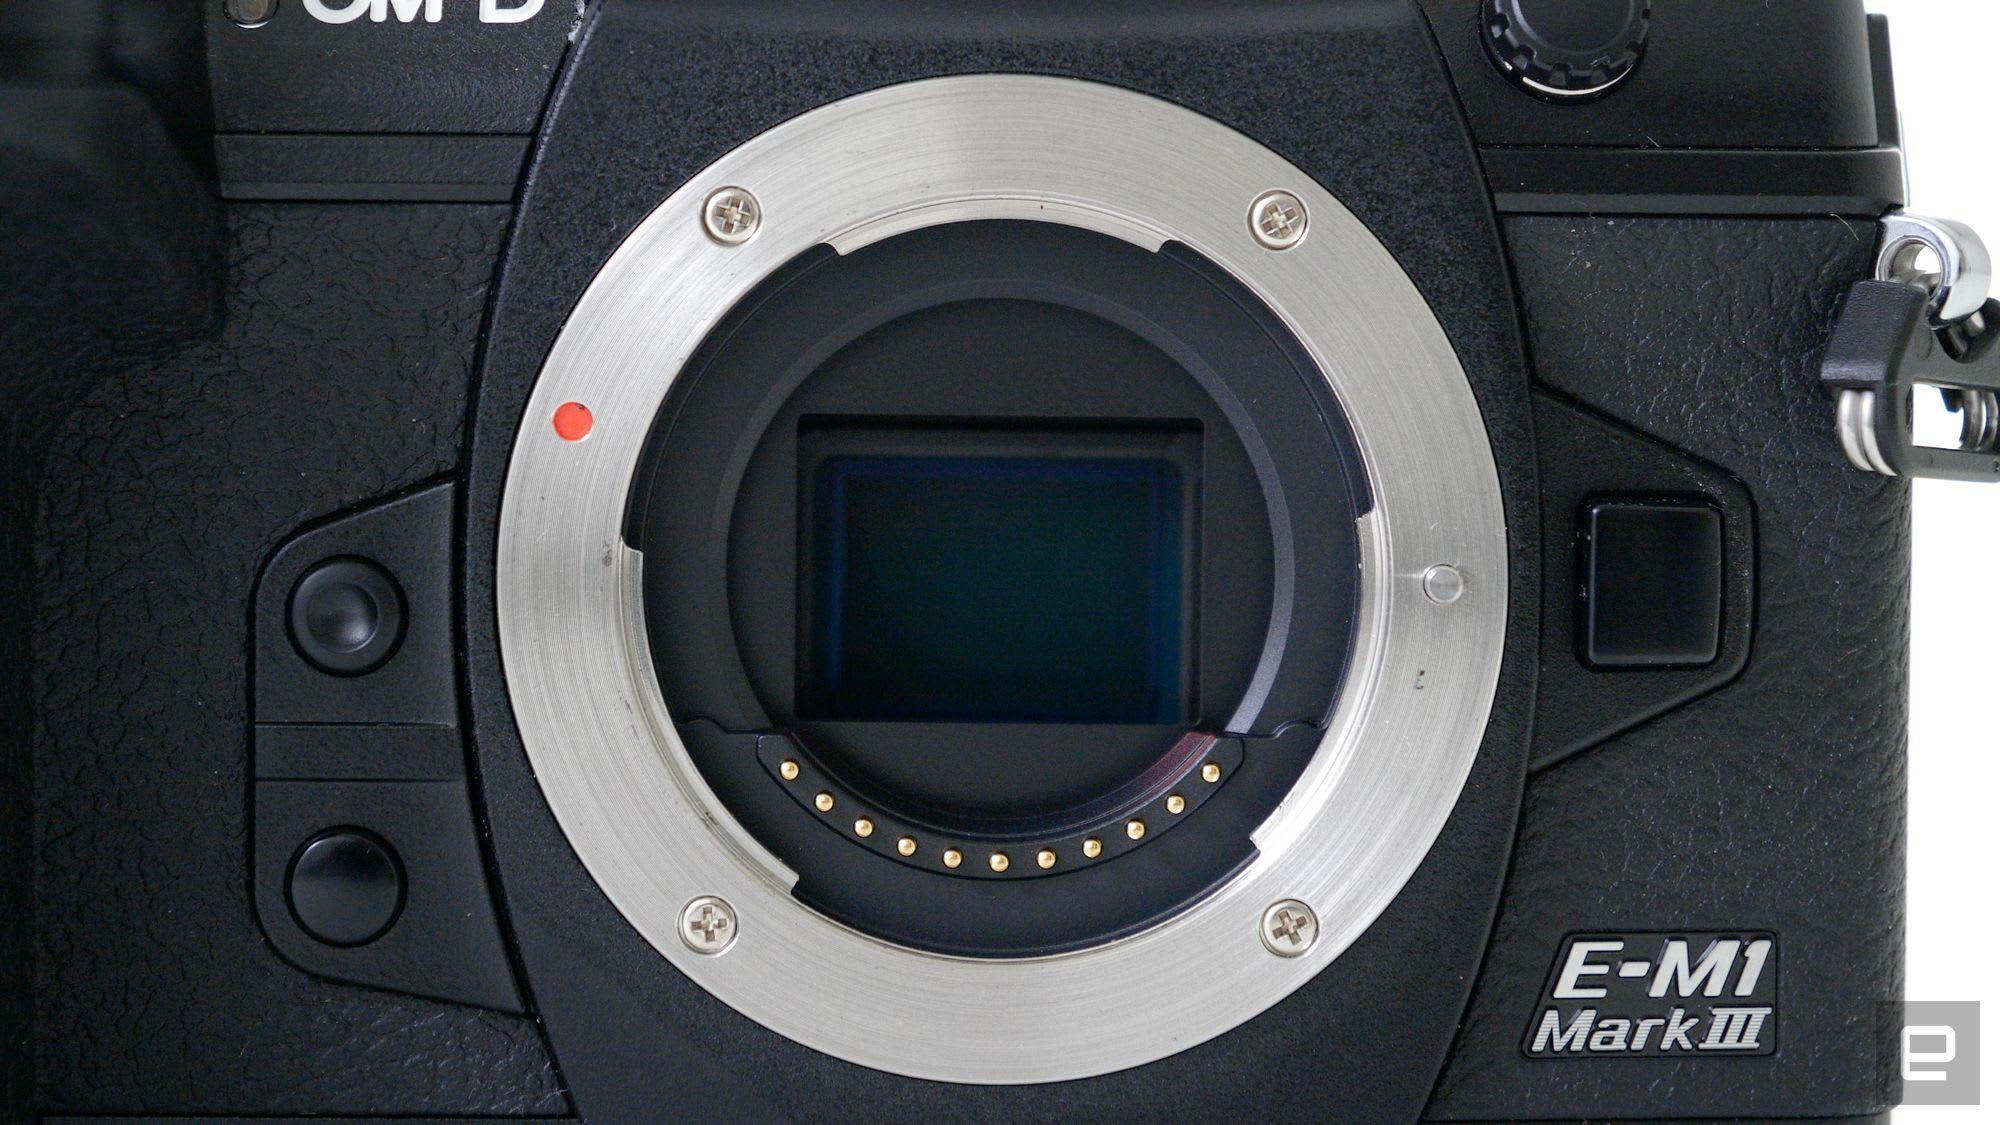 Olympus O-MD E-M1 Mark III Micro Four Thirds mirrorless camera